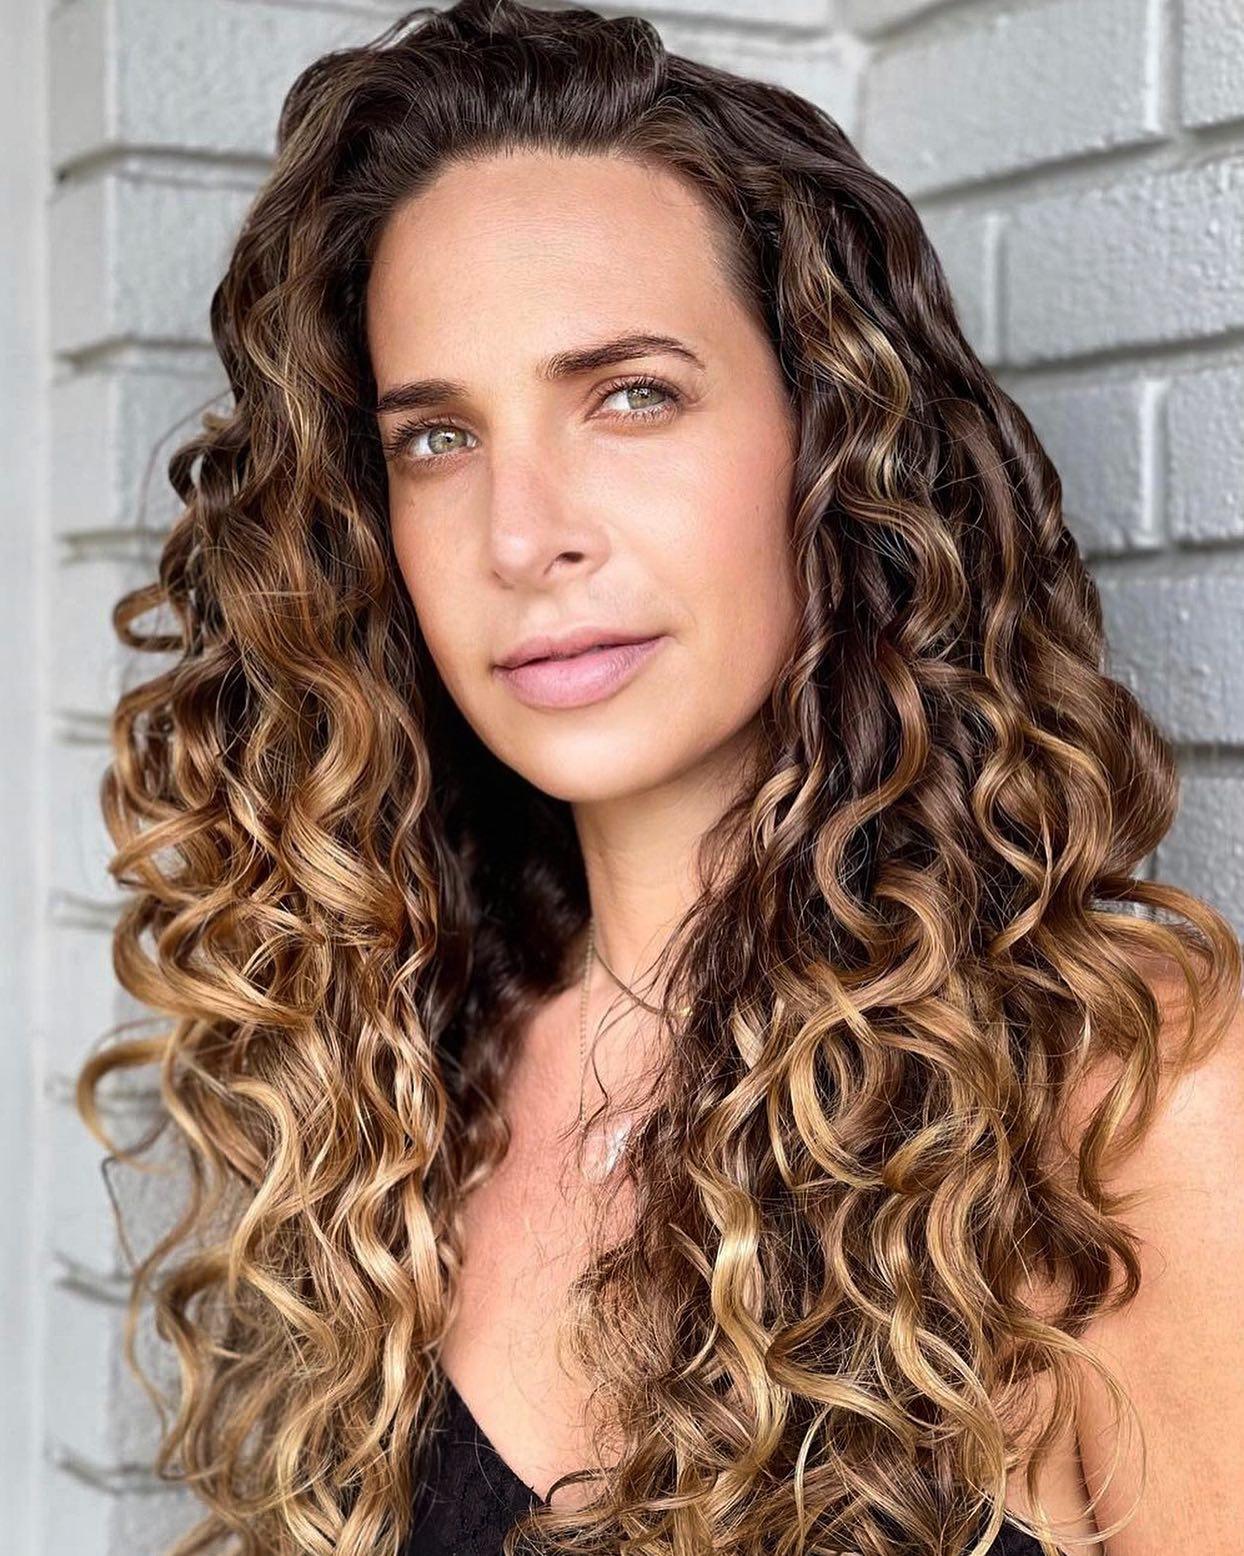 Perfect curls happen with the understanding of water